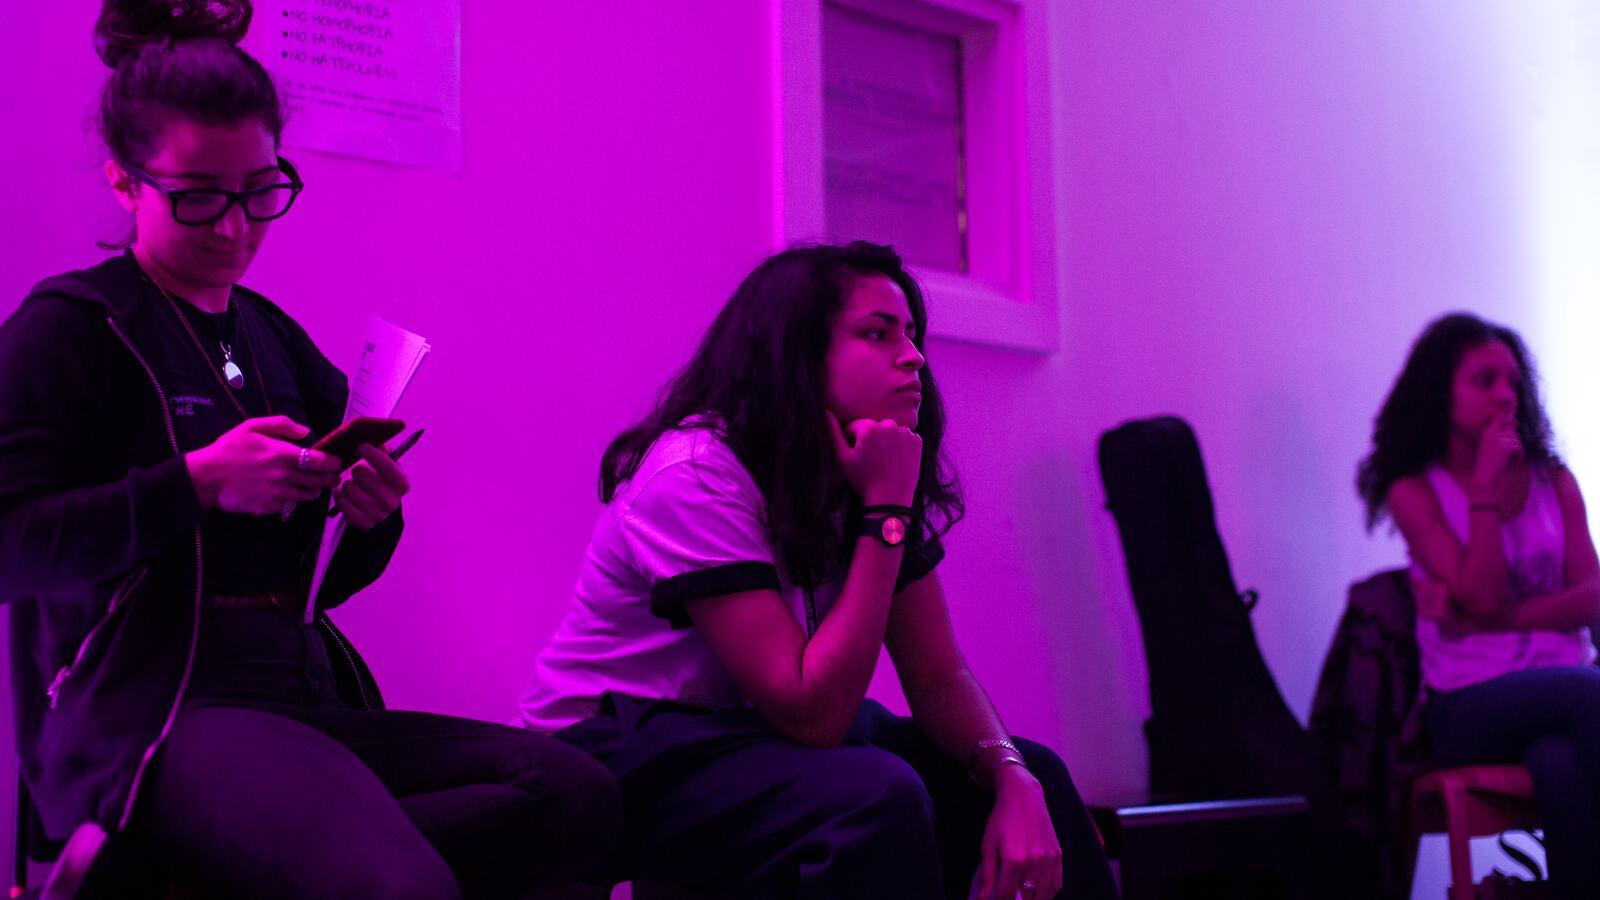 Violet Nights at Southbank Centre